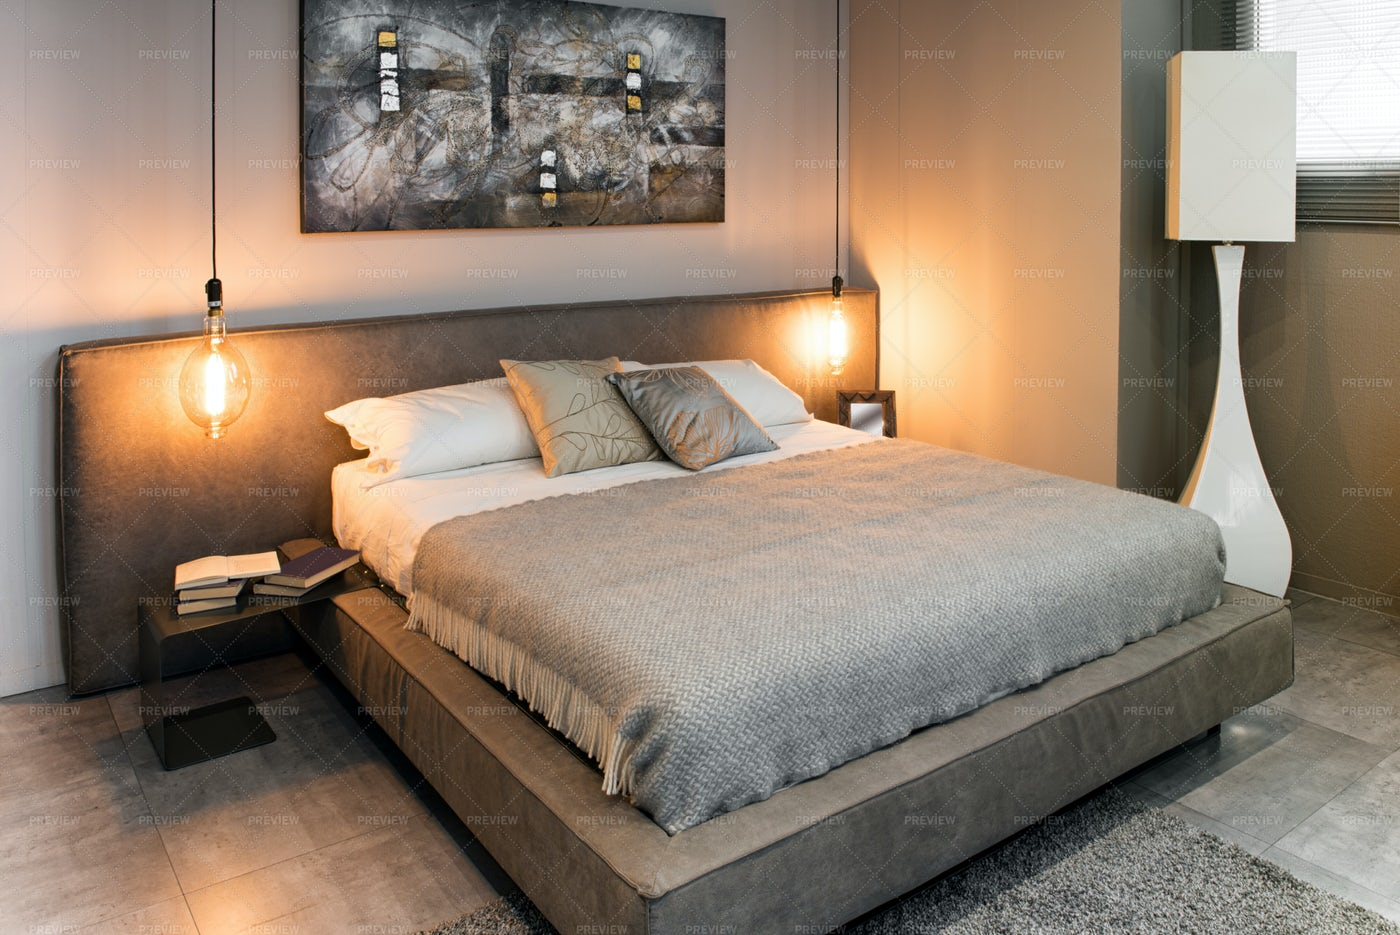 Bed In Cozy Bedroom: Stock Photos